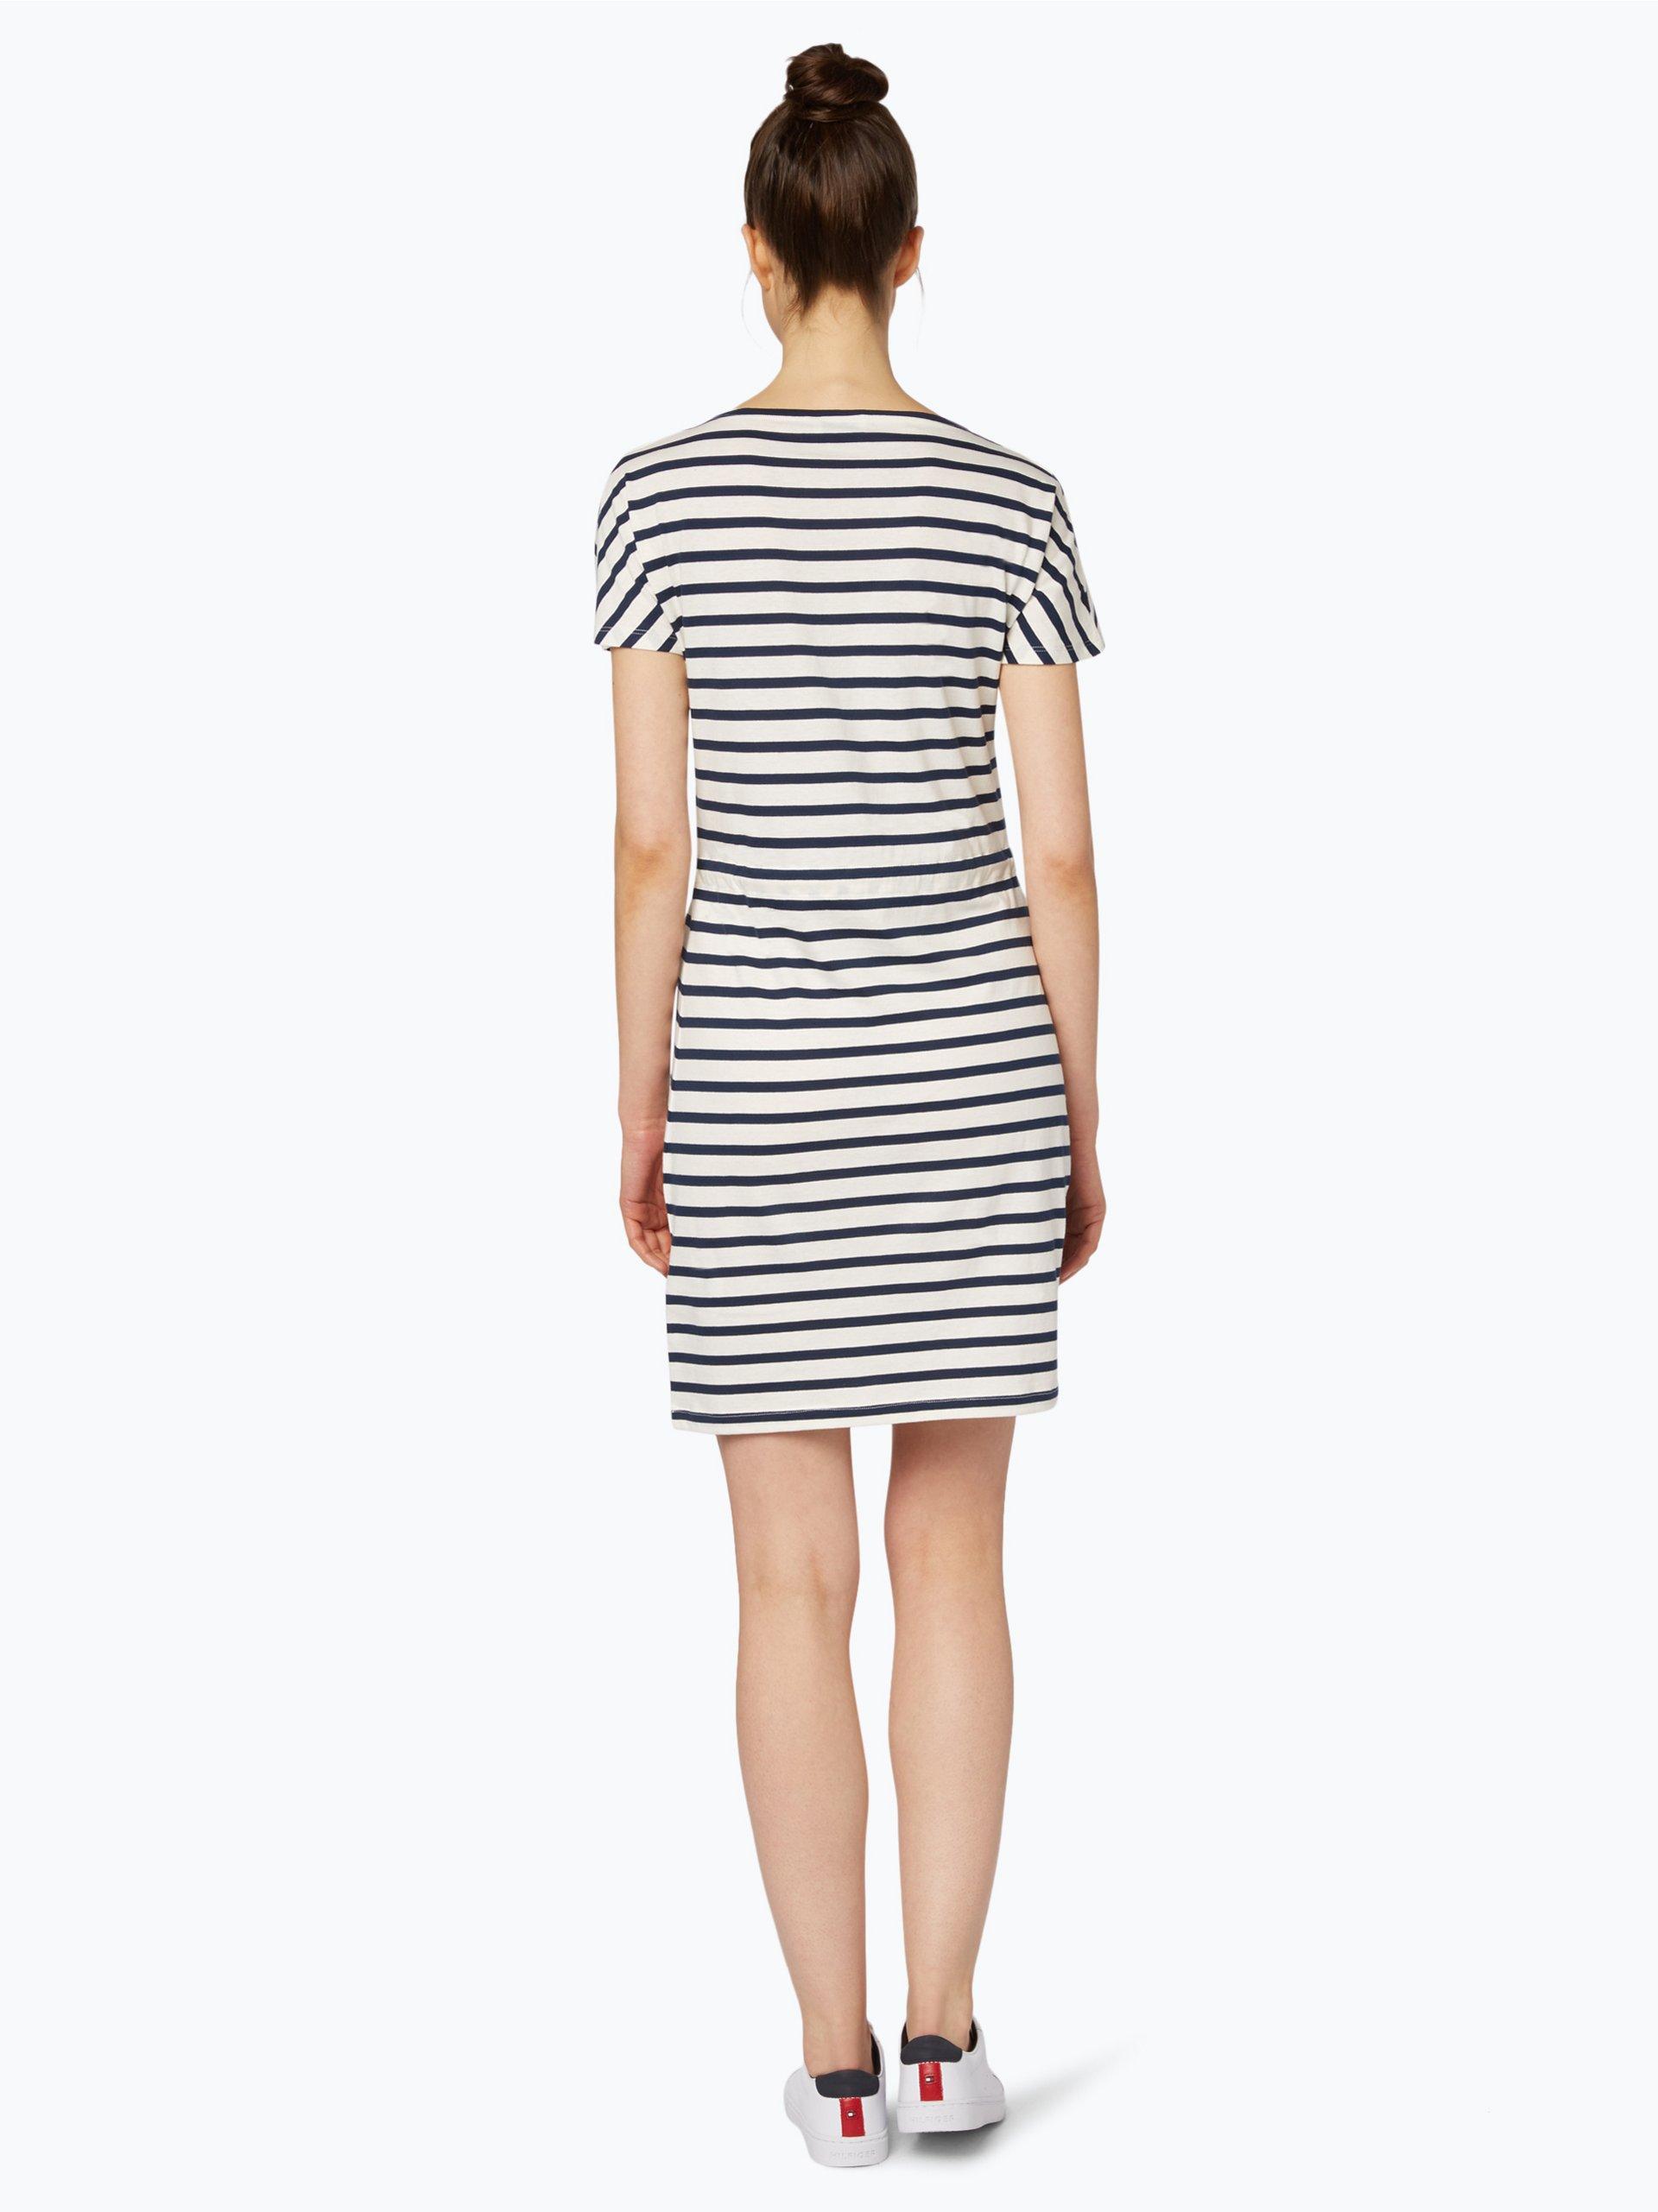 hilfiger denim damen kleid wei gestreift online kaufen vangraaf com. Black Bedroom Furniture Sets. Home Design Ideas